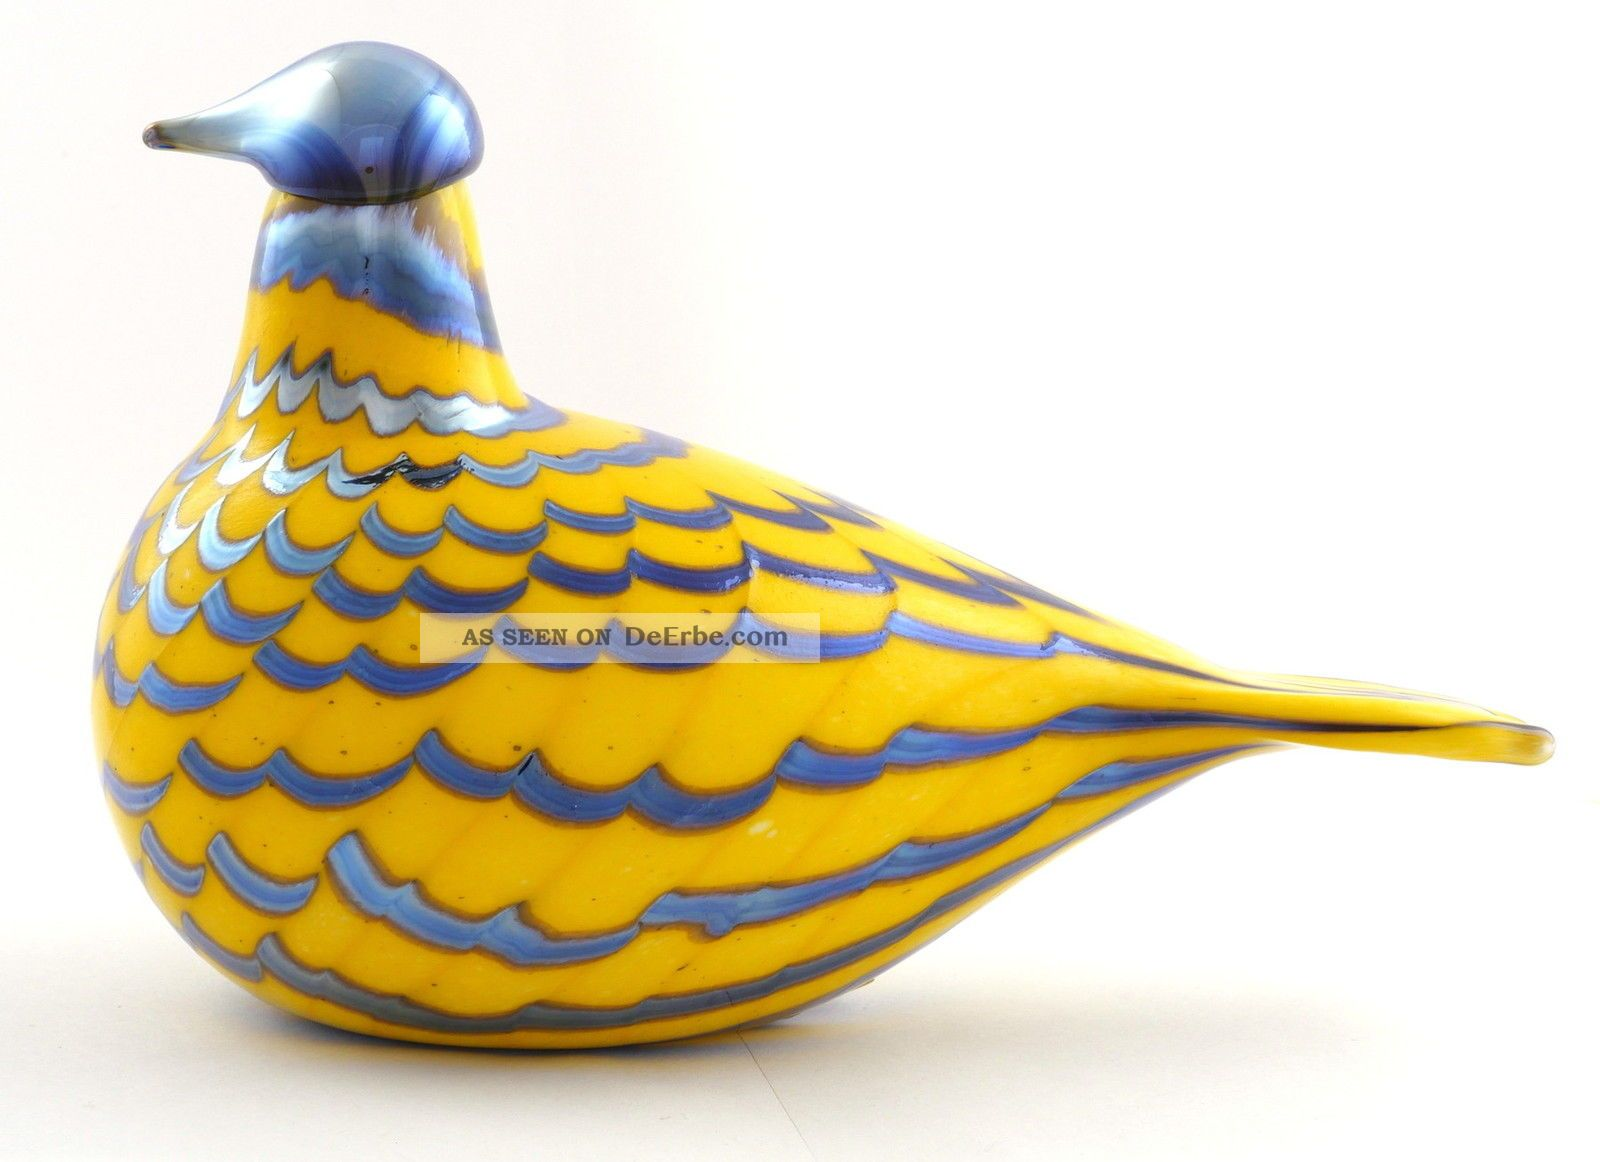 Birds By Toikka Glasvogel Yellow Grouse 215 X 130 Mm Iittala Sammlerglas Bild